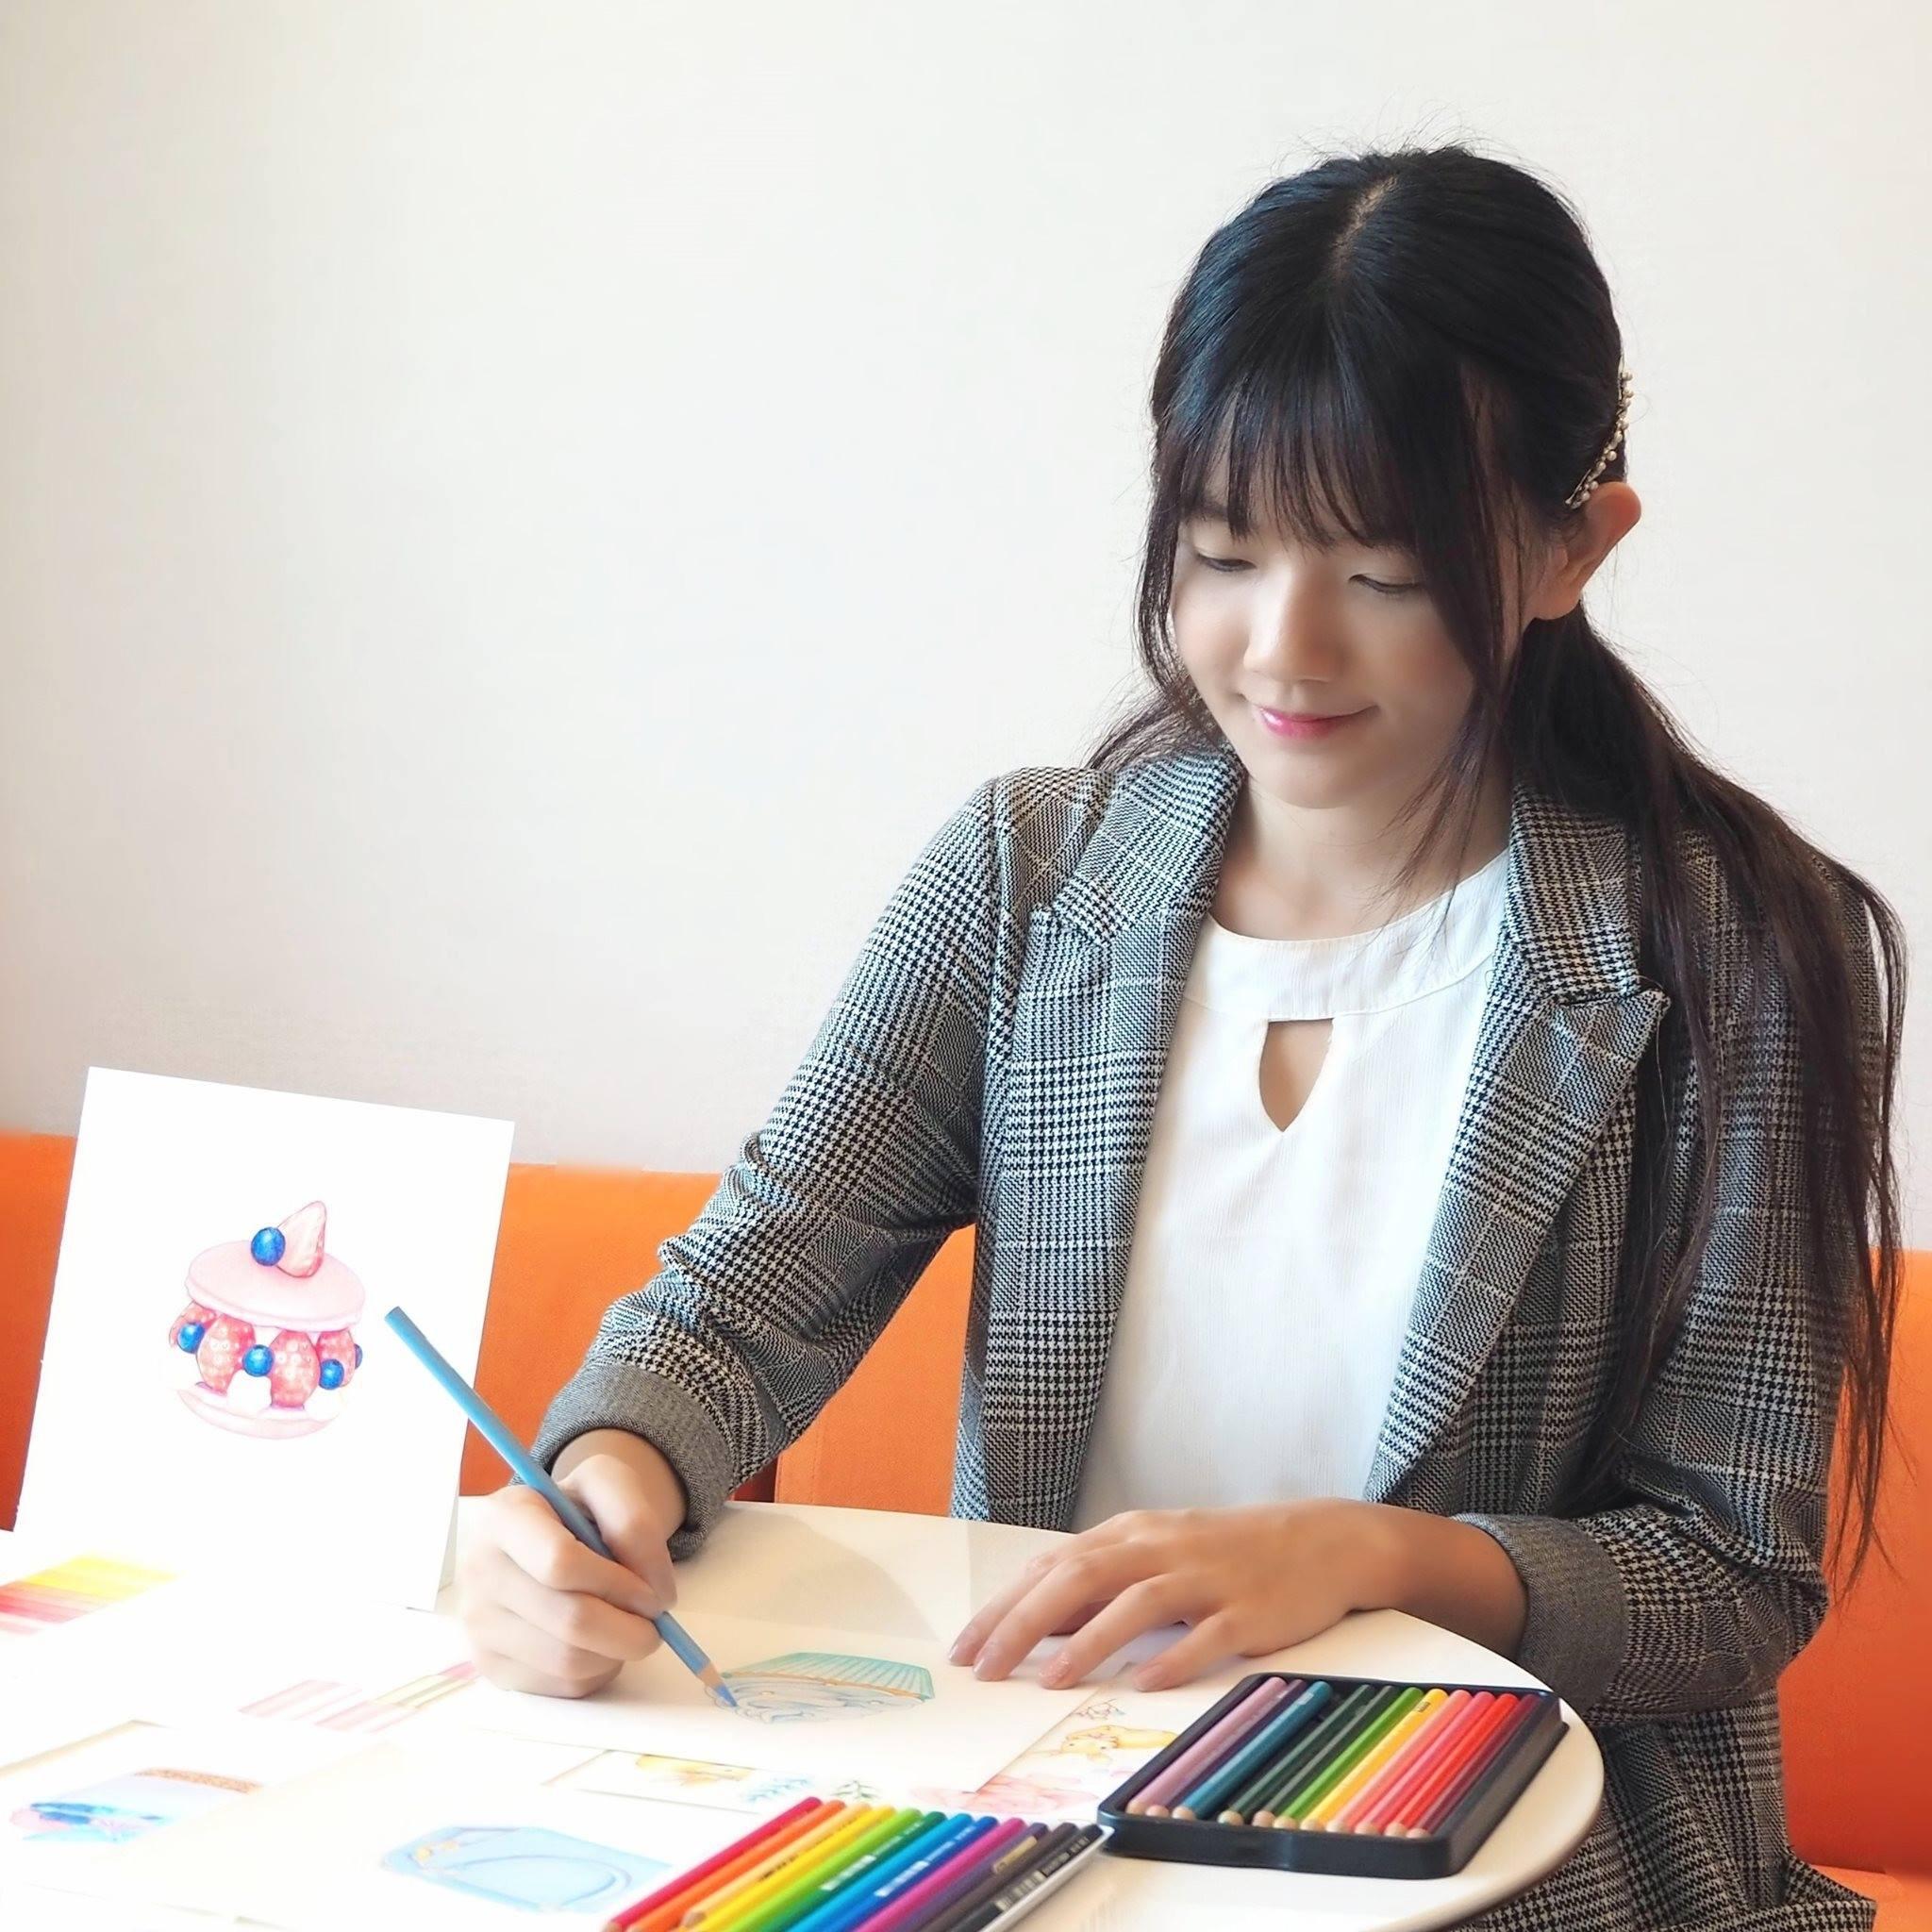 @rose_illustration Profile Image   Linktree